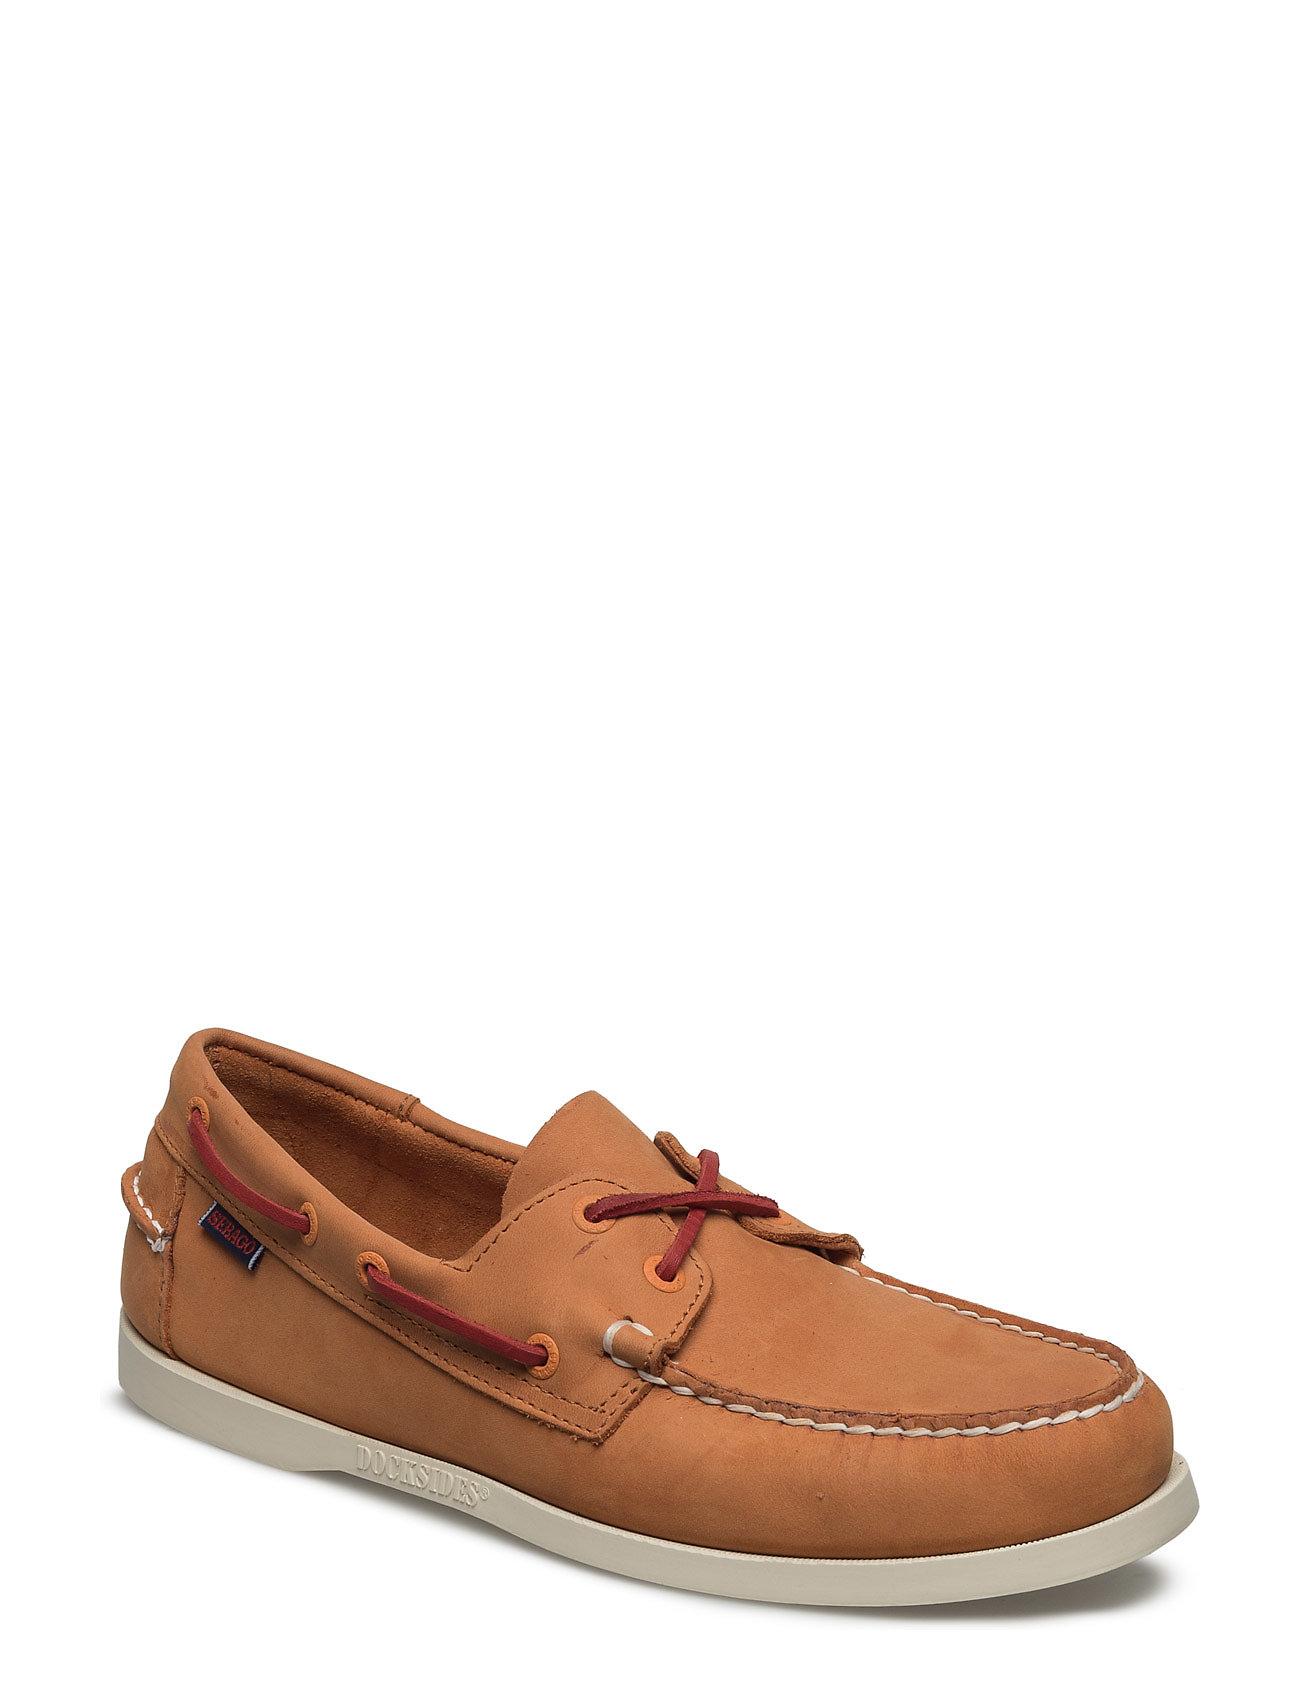 Docksides Sebago Casual sko til Herrer i